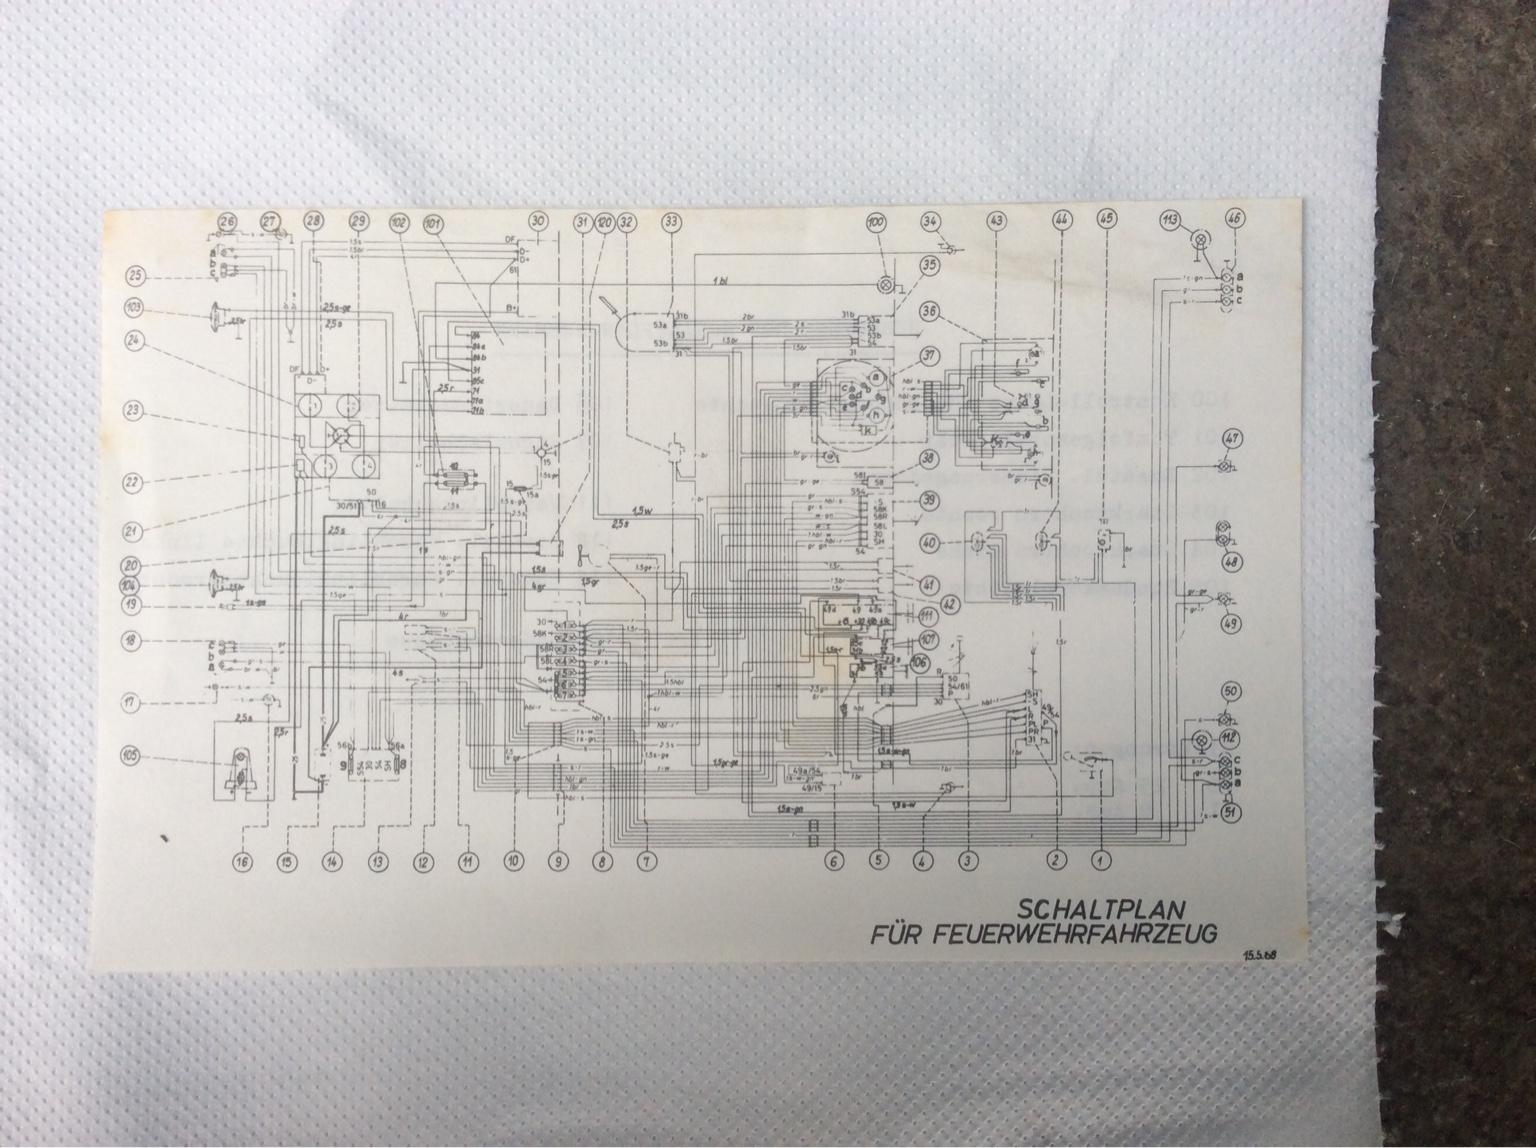 VZ_0653] Wiring Diagrams For Ford Ambulance Wiring DiagramDness Vira Sequ Ehir Mentra Trons Mohammedshrine Librar Wiring 101